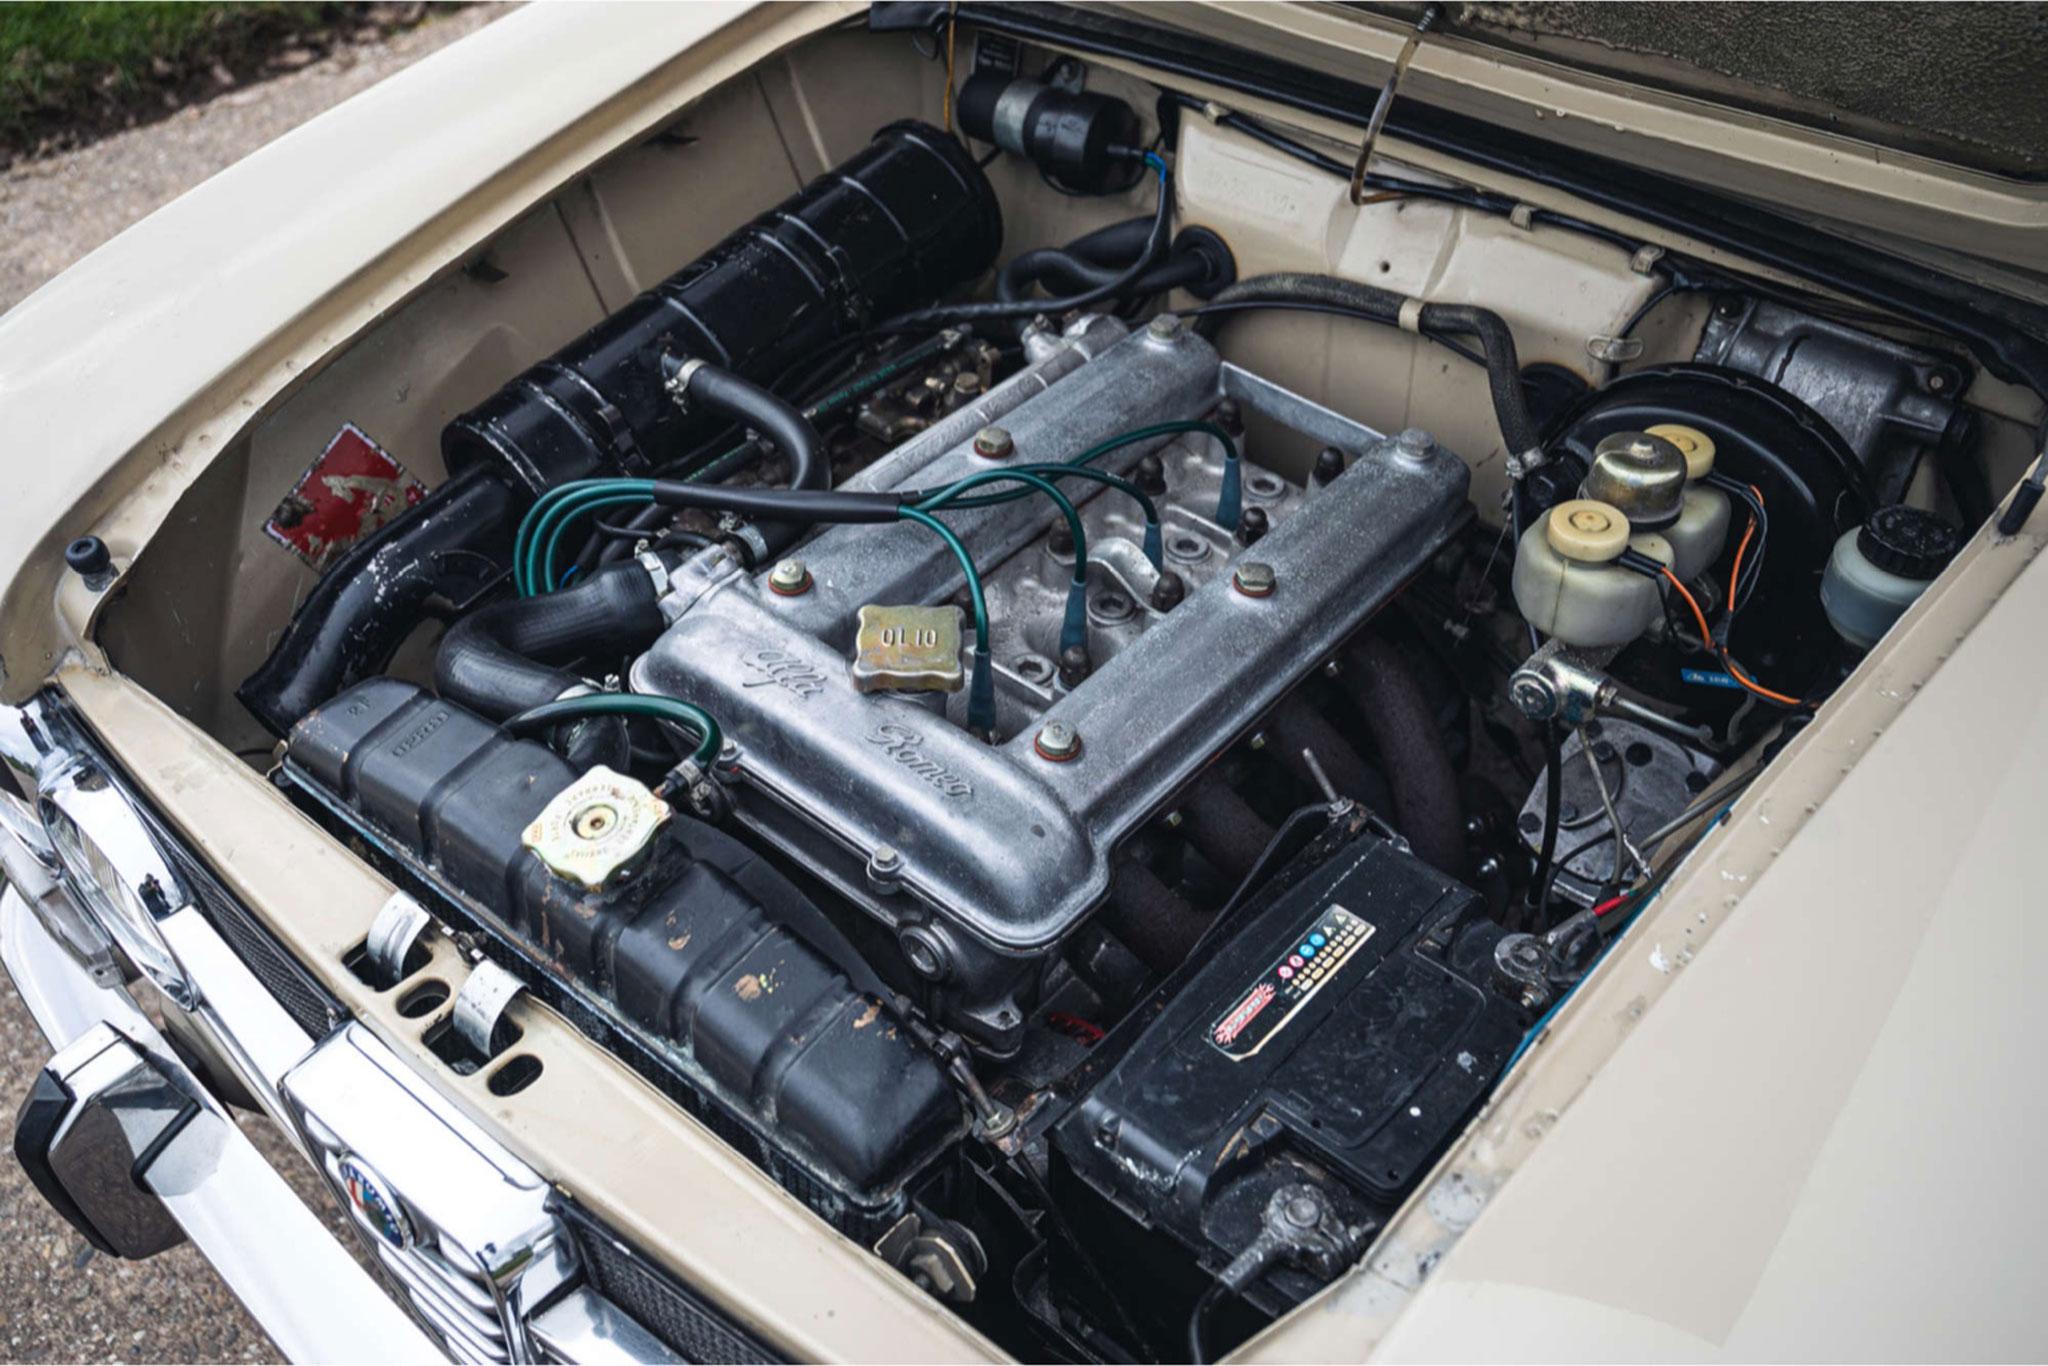 1972 Alfa Romeo Giulia Super 1.3 moteur 1290cc quatre cylindres 89 chevaux